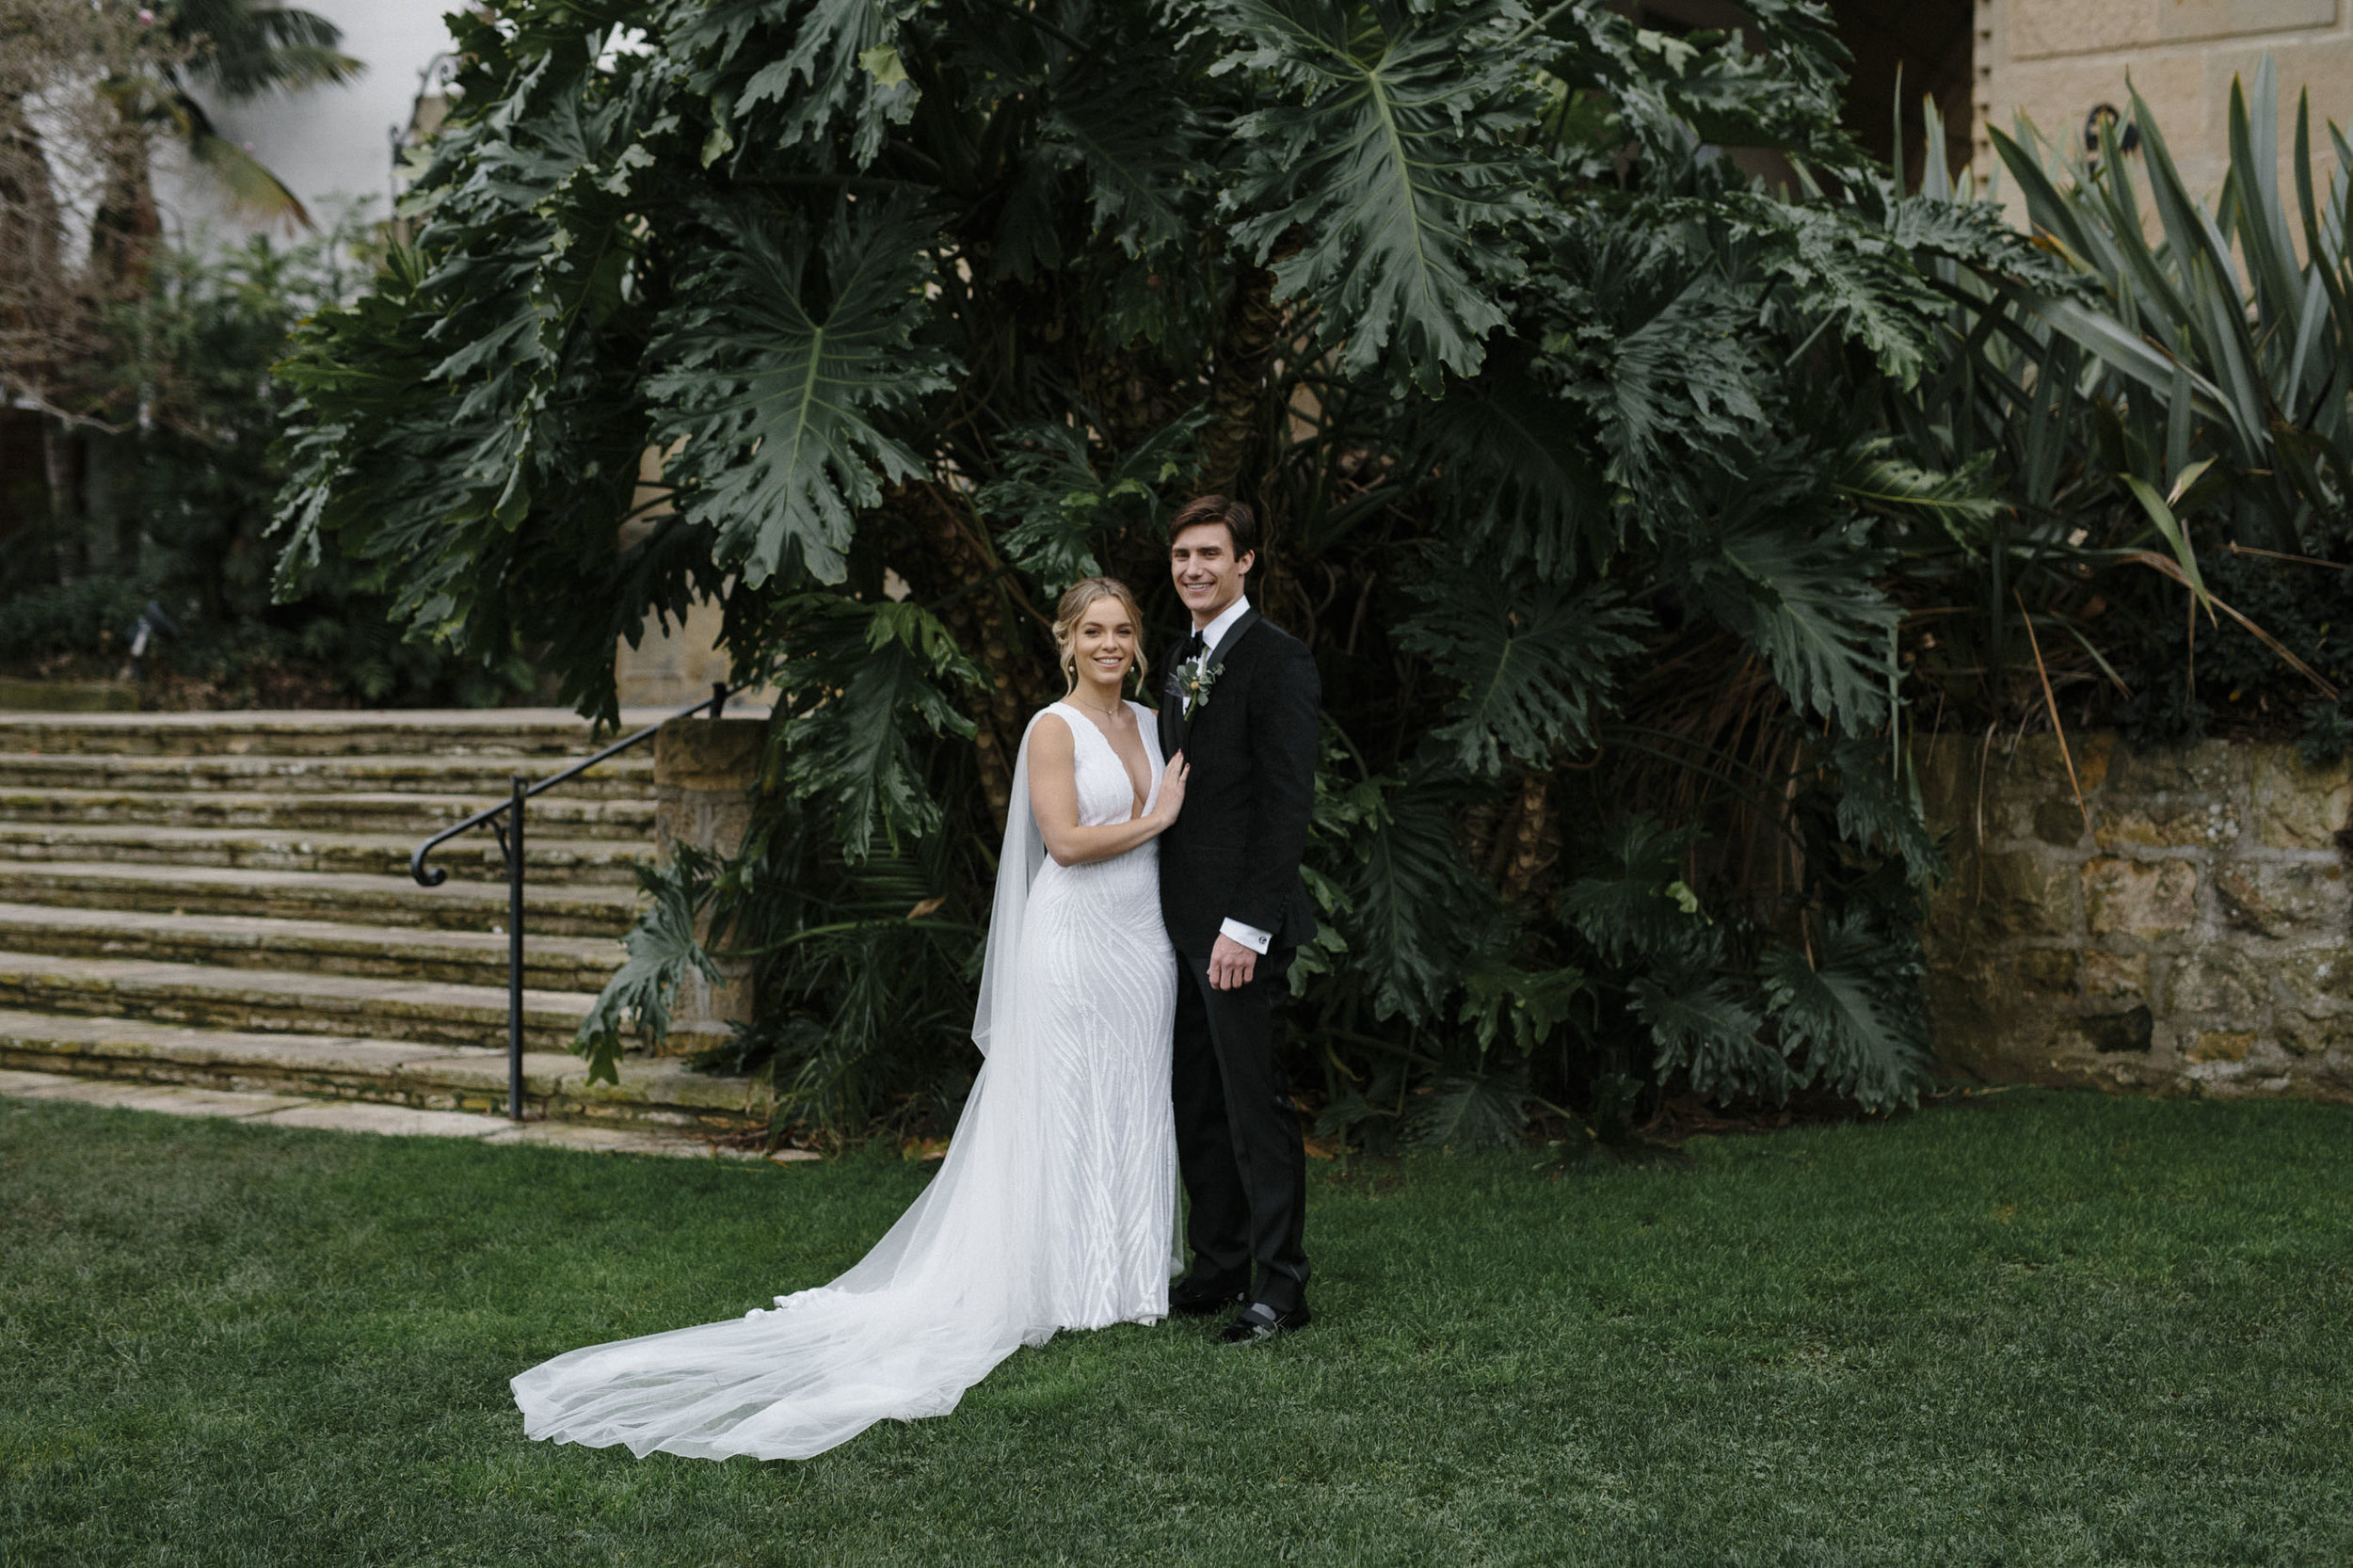 Reilly & Chris Wedding-93.jpg